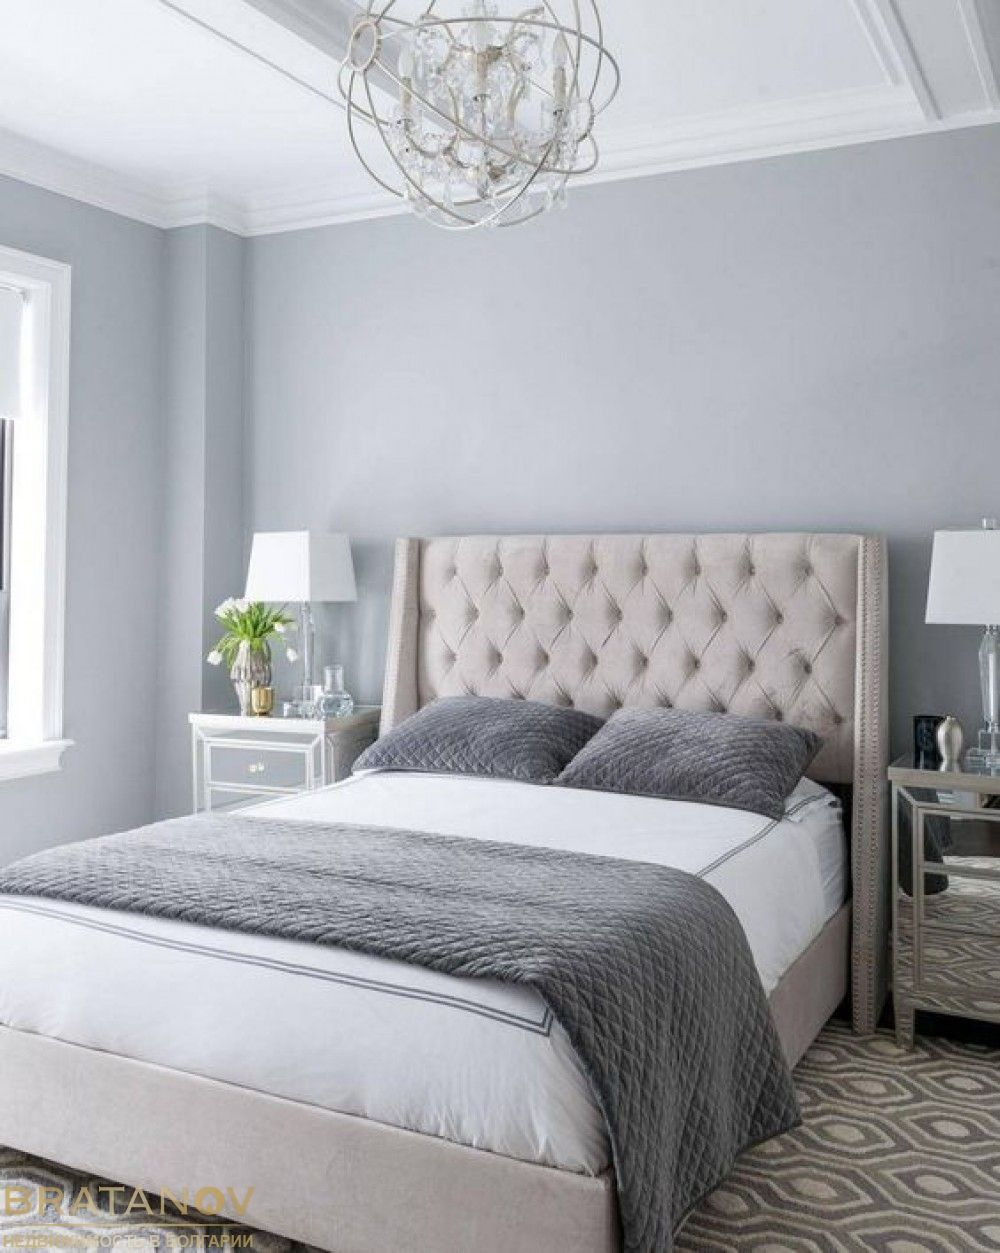 Bedroom Paint Color Ideas Bedroompaintcolorideas Best Bedroom Paint Colors Bedroom Paint Colors Master Bedroom Remodel Master Bedroom Colors Small Bedroom